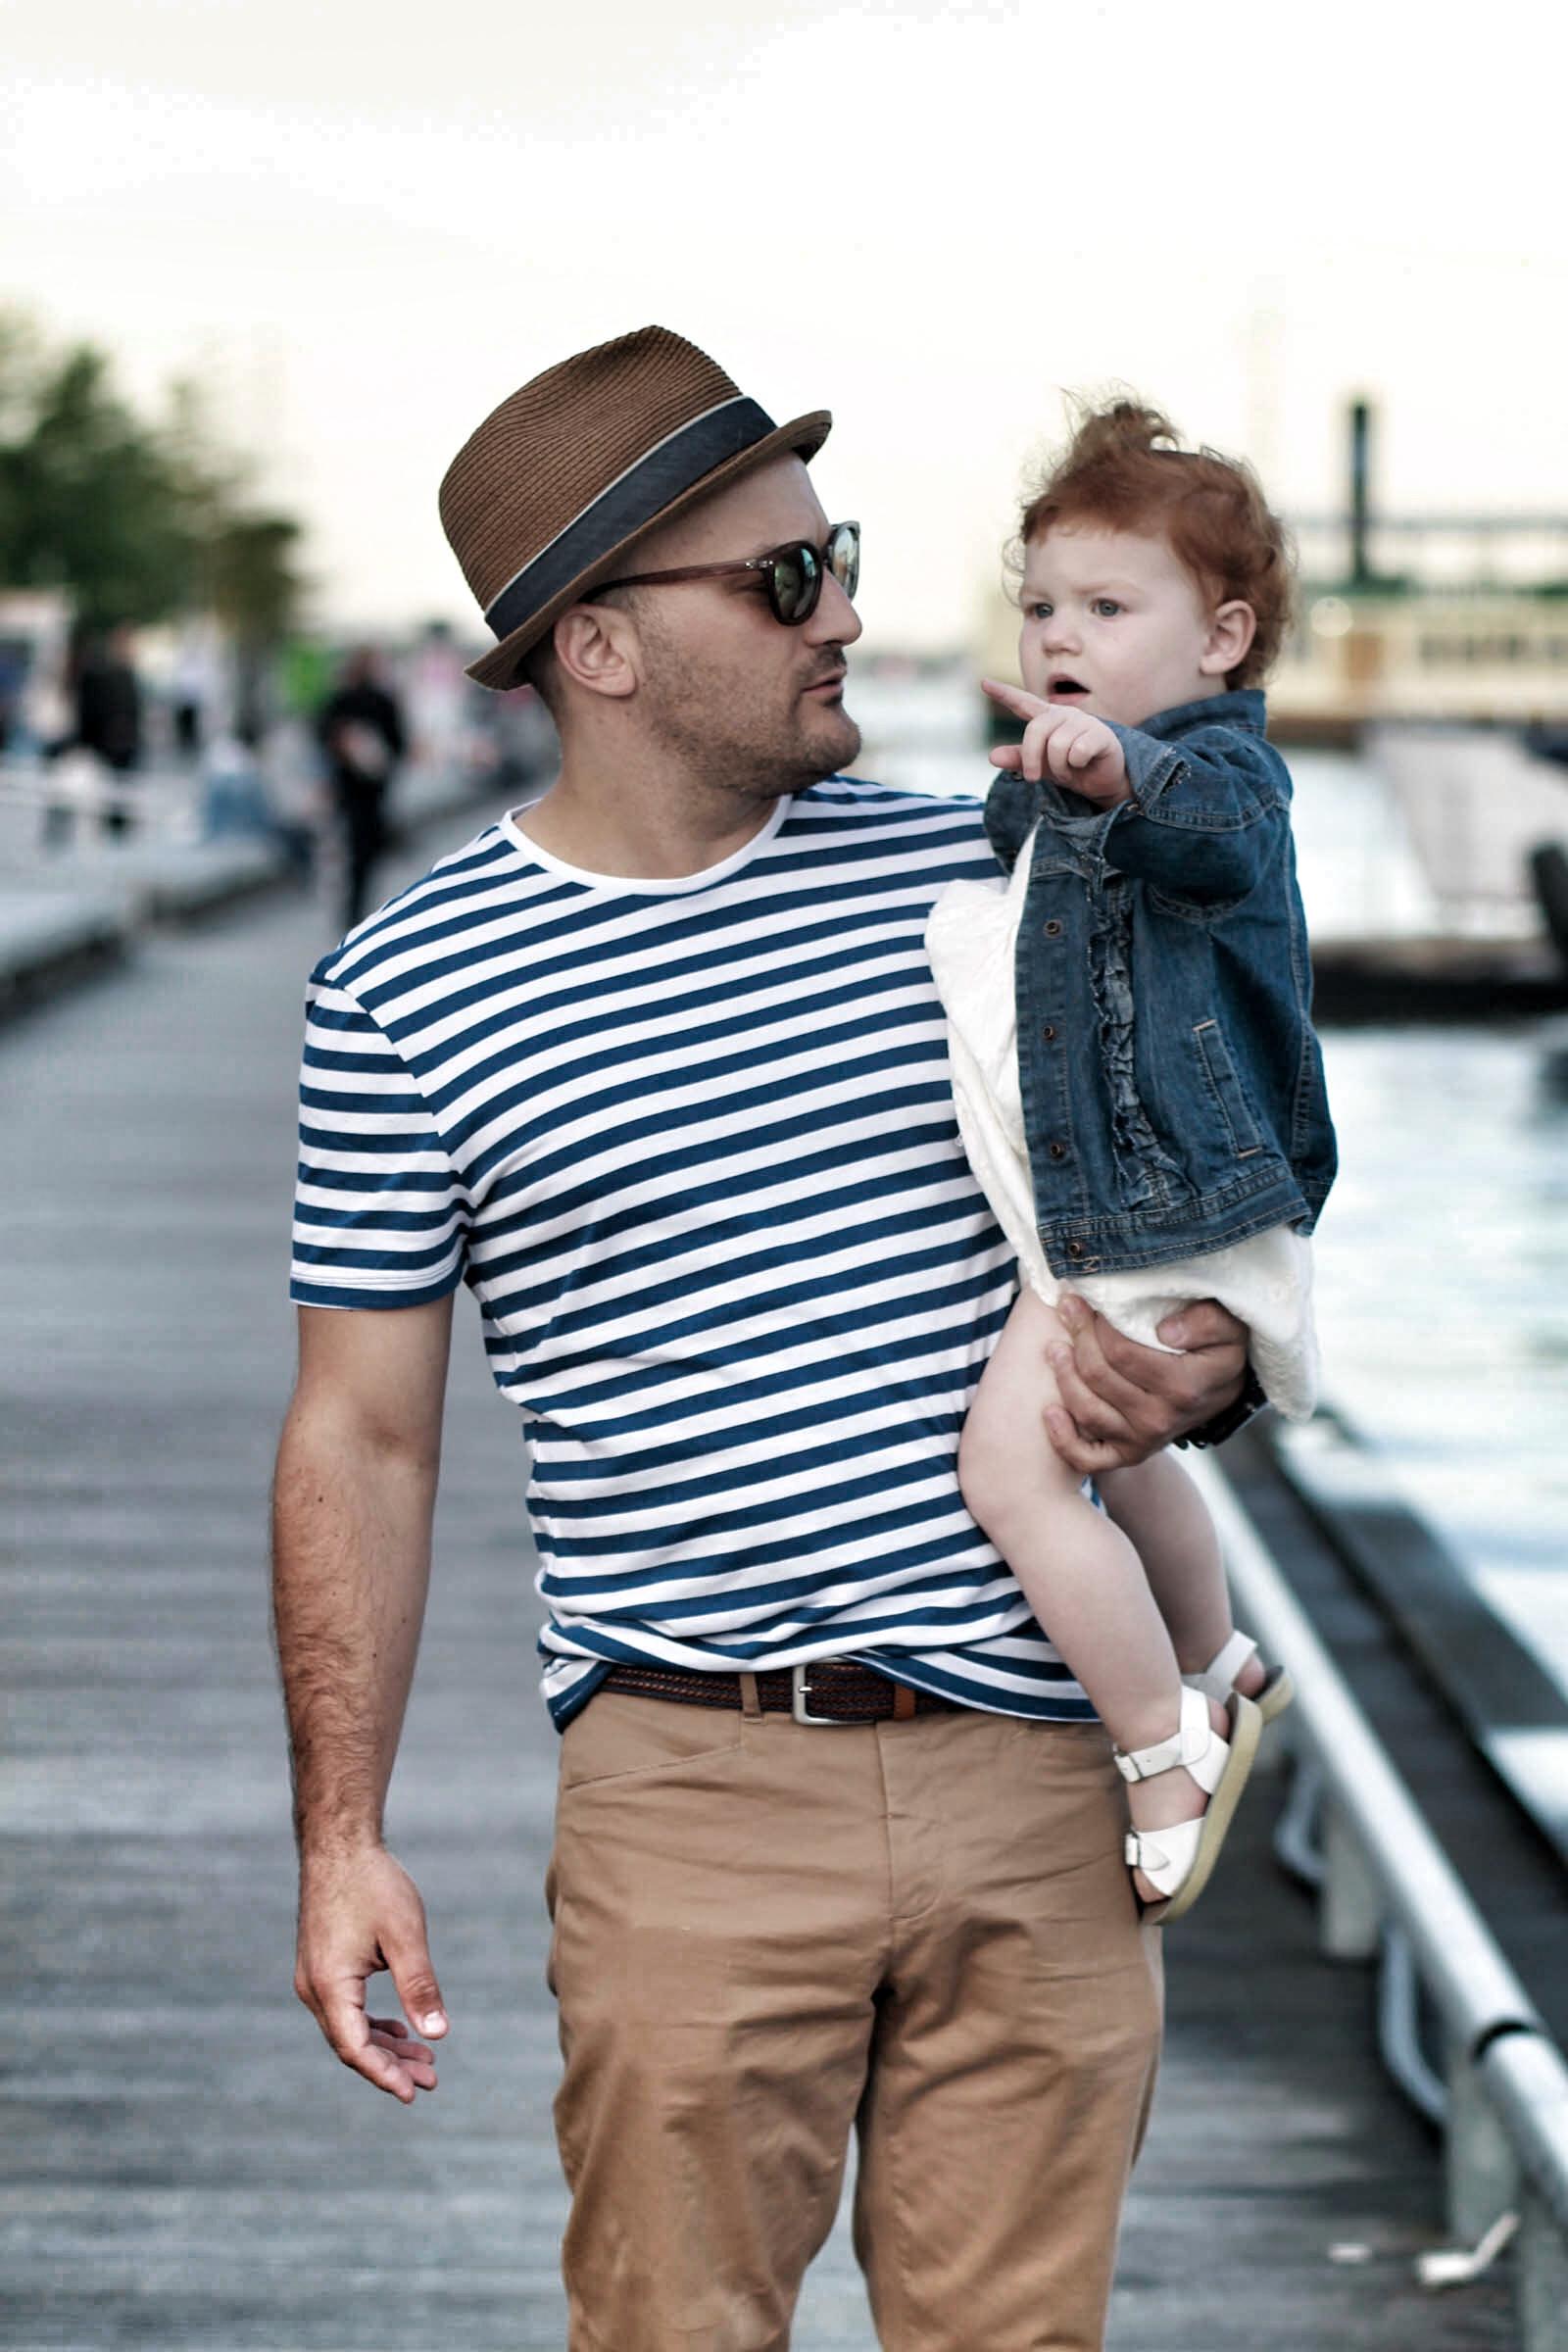 RW&CO Breton striped t-shirt